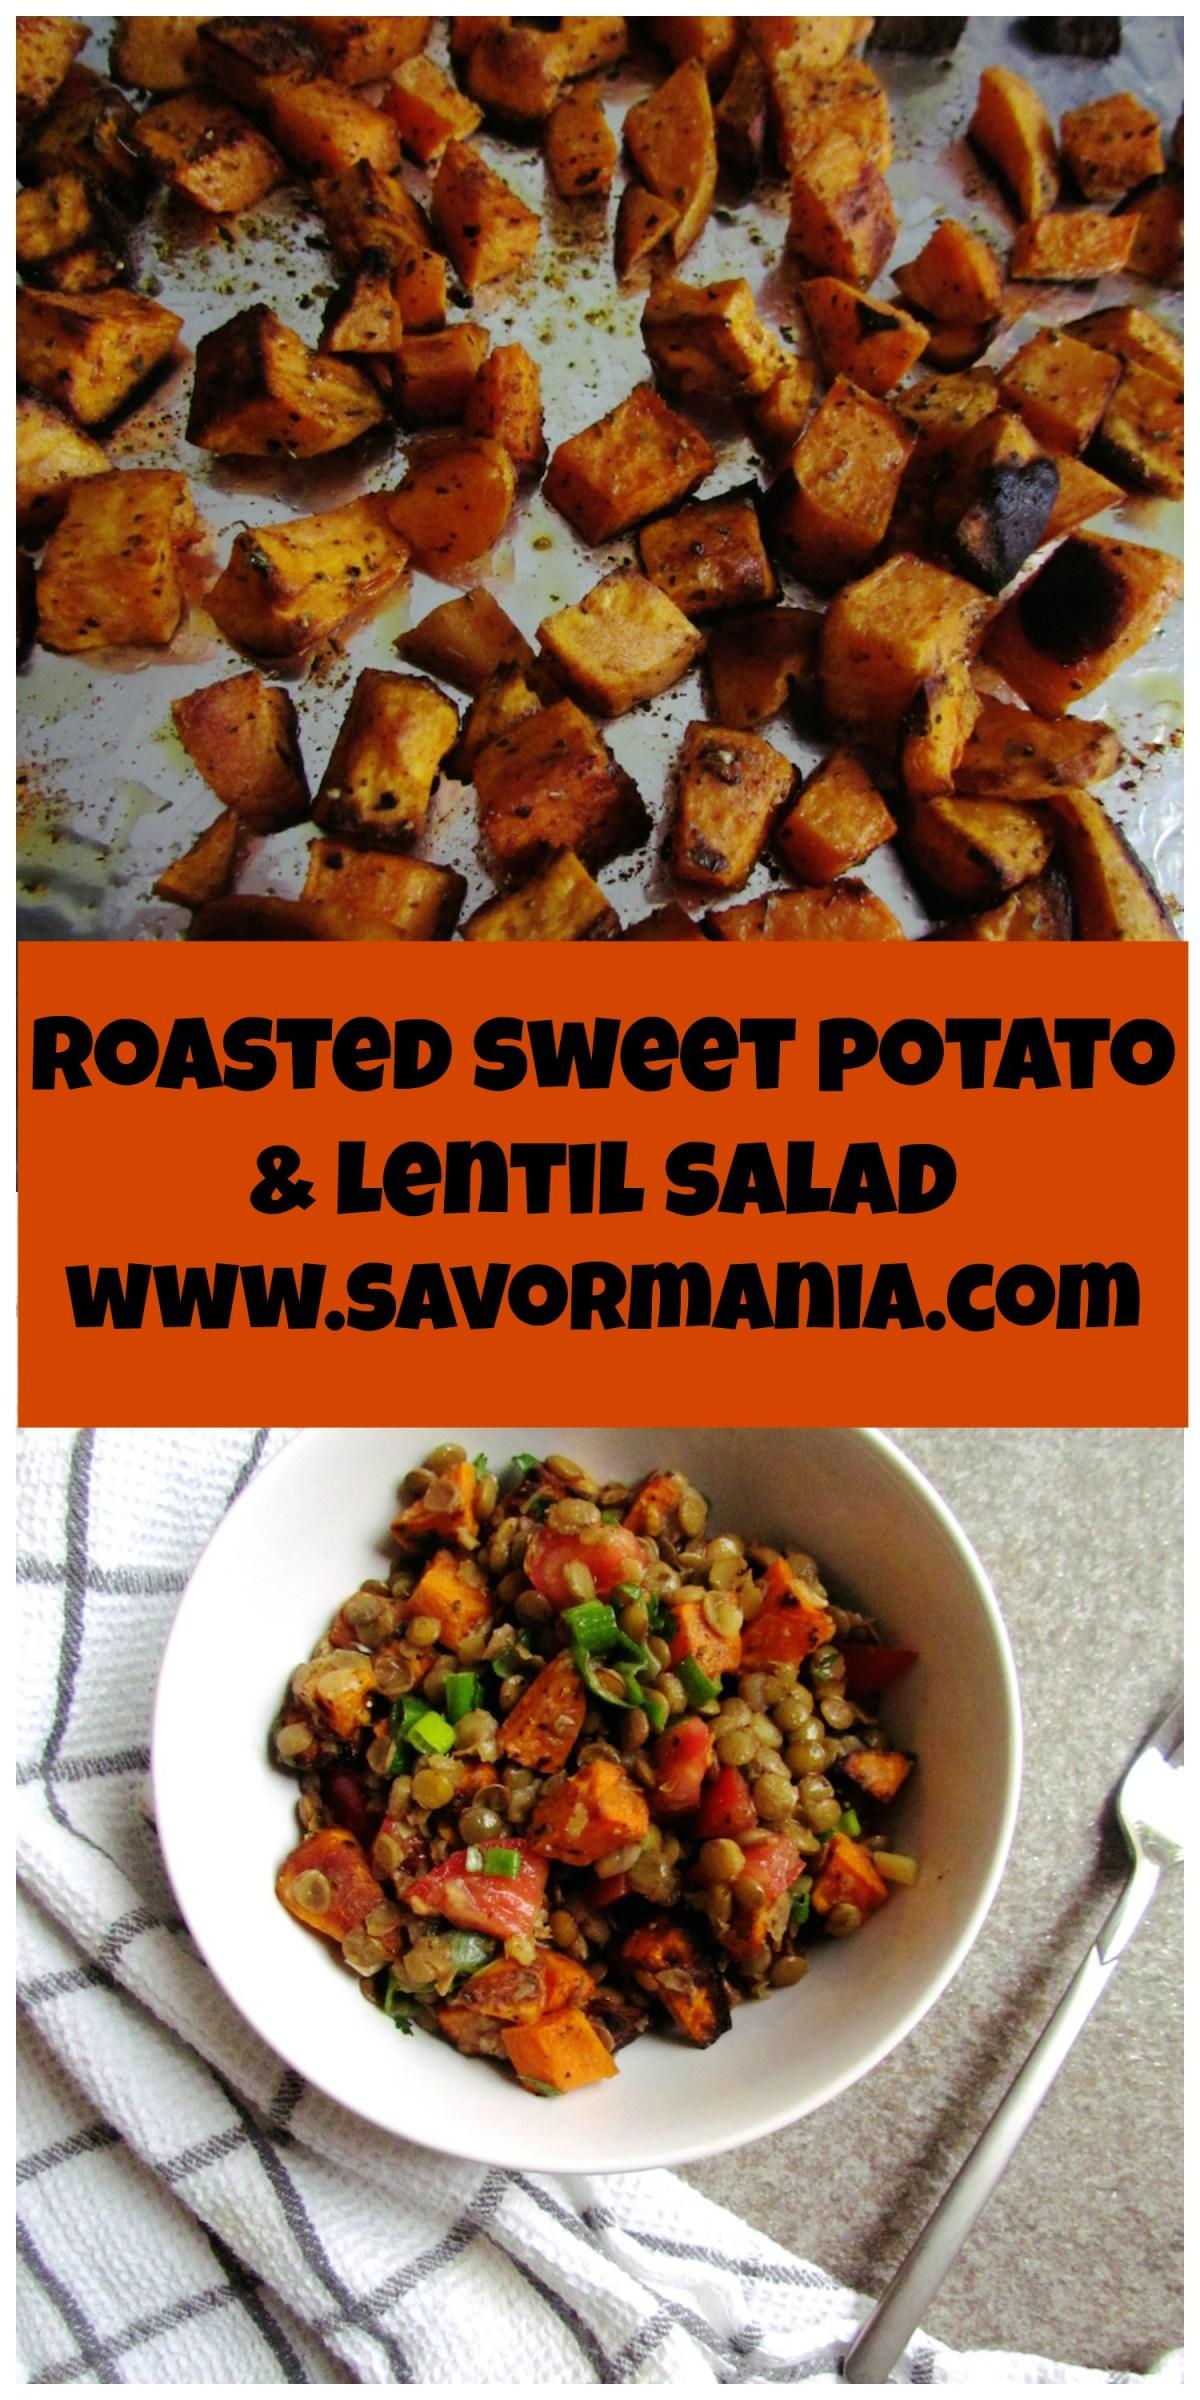 roasted sweet potato and lentil salad | www.savormania.com